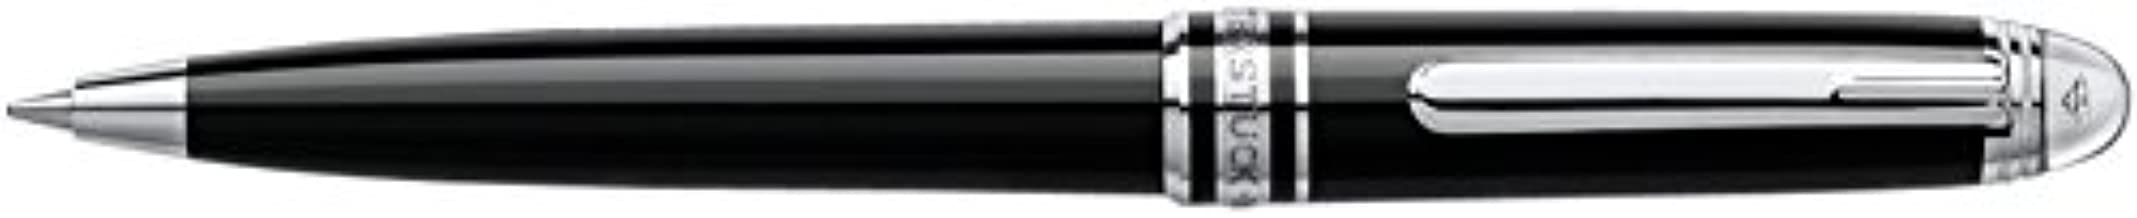 Montblanc Meisterstuck Diamond Hommage wa Mozart Ballpoint Pen 107546